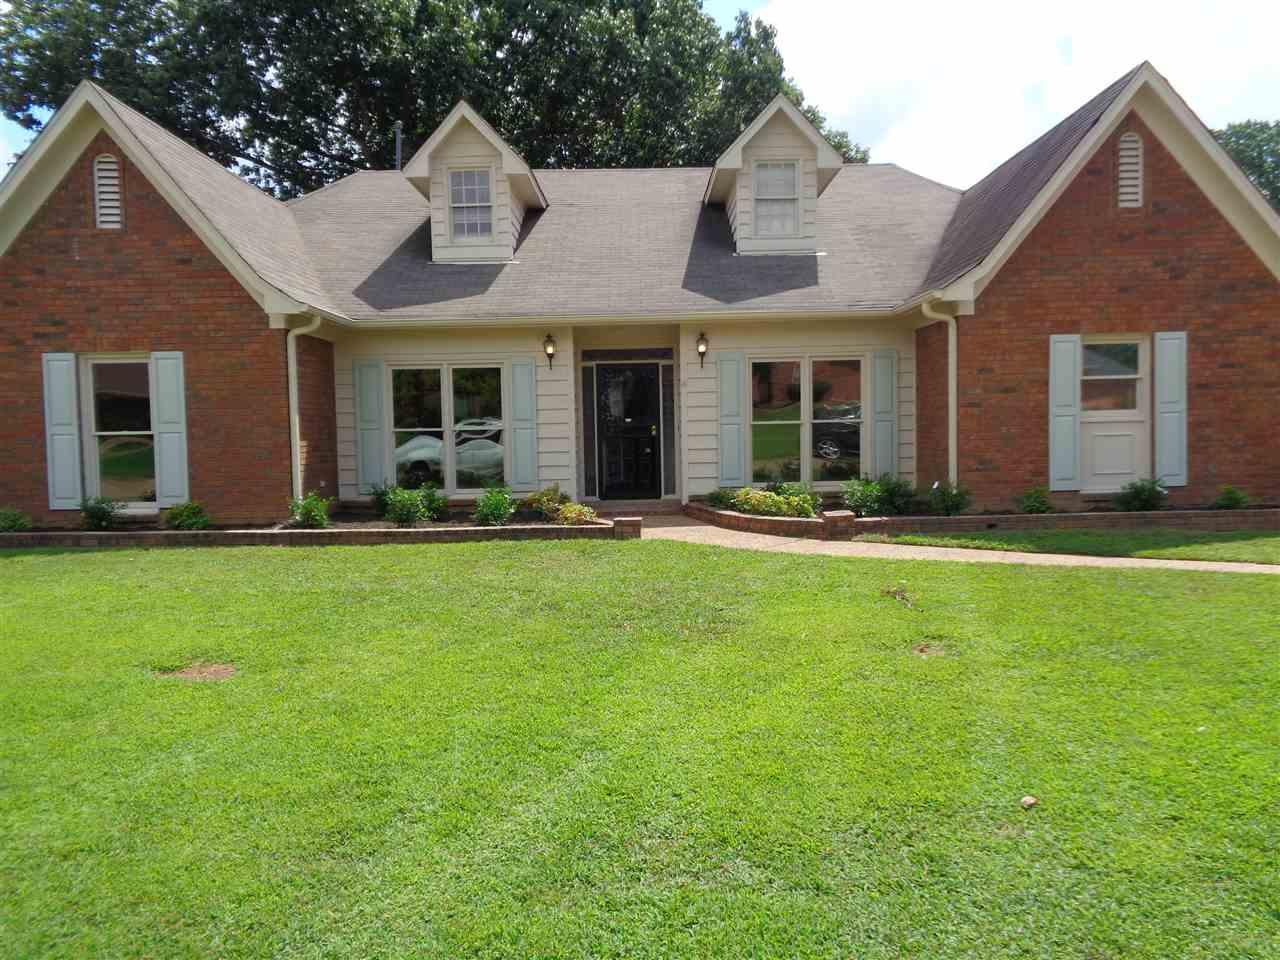 5112 Cotswold Memphis, TN 38125 - MLS #: 10008689